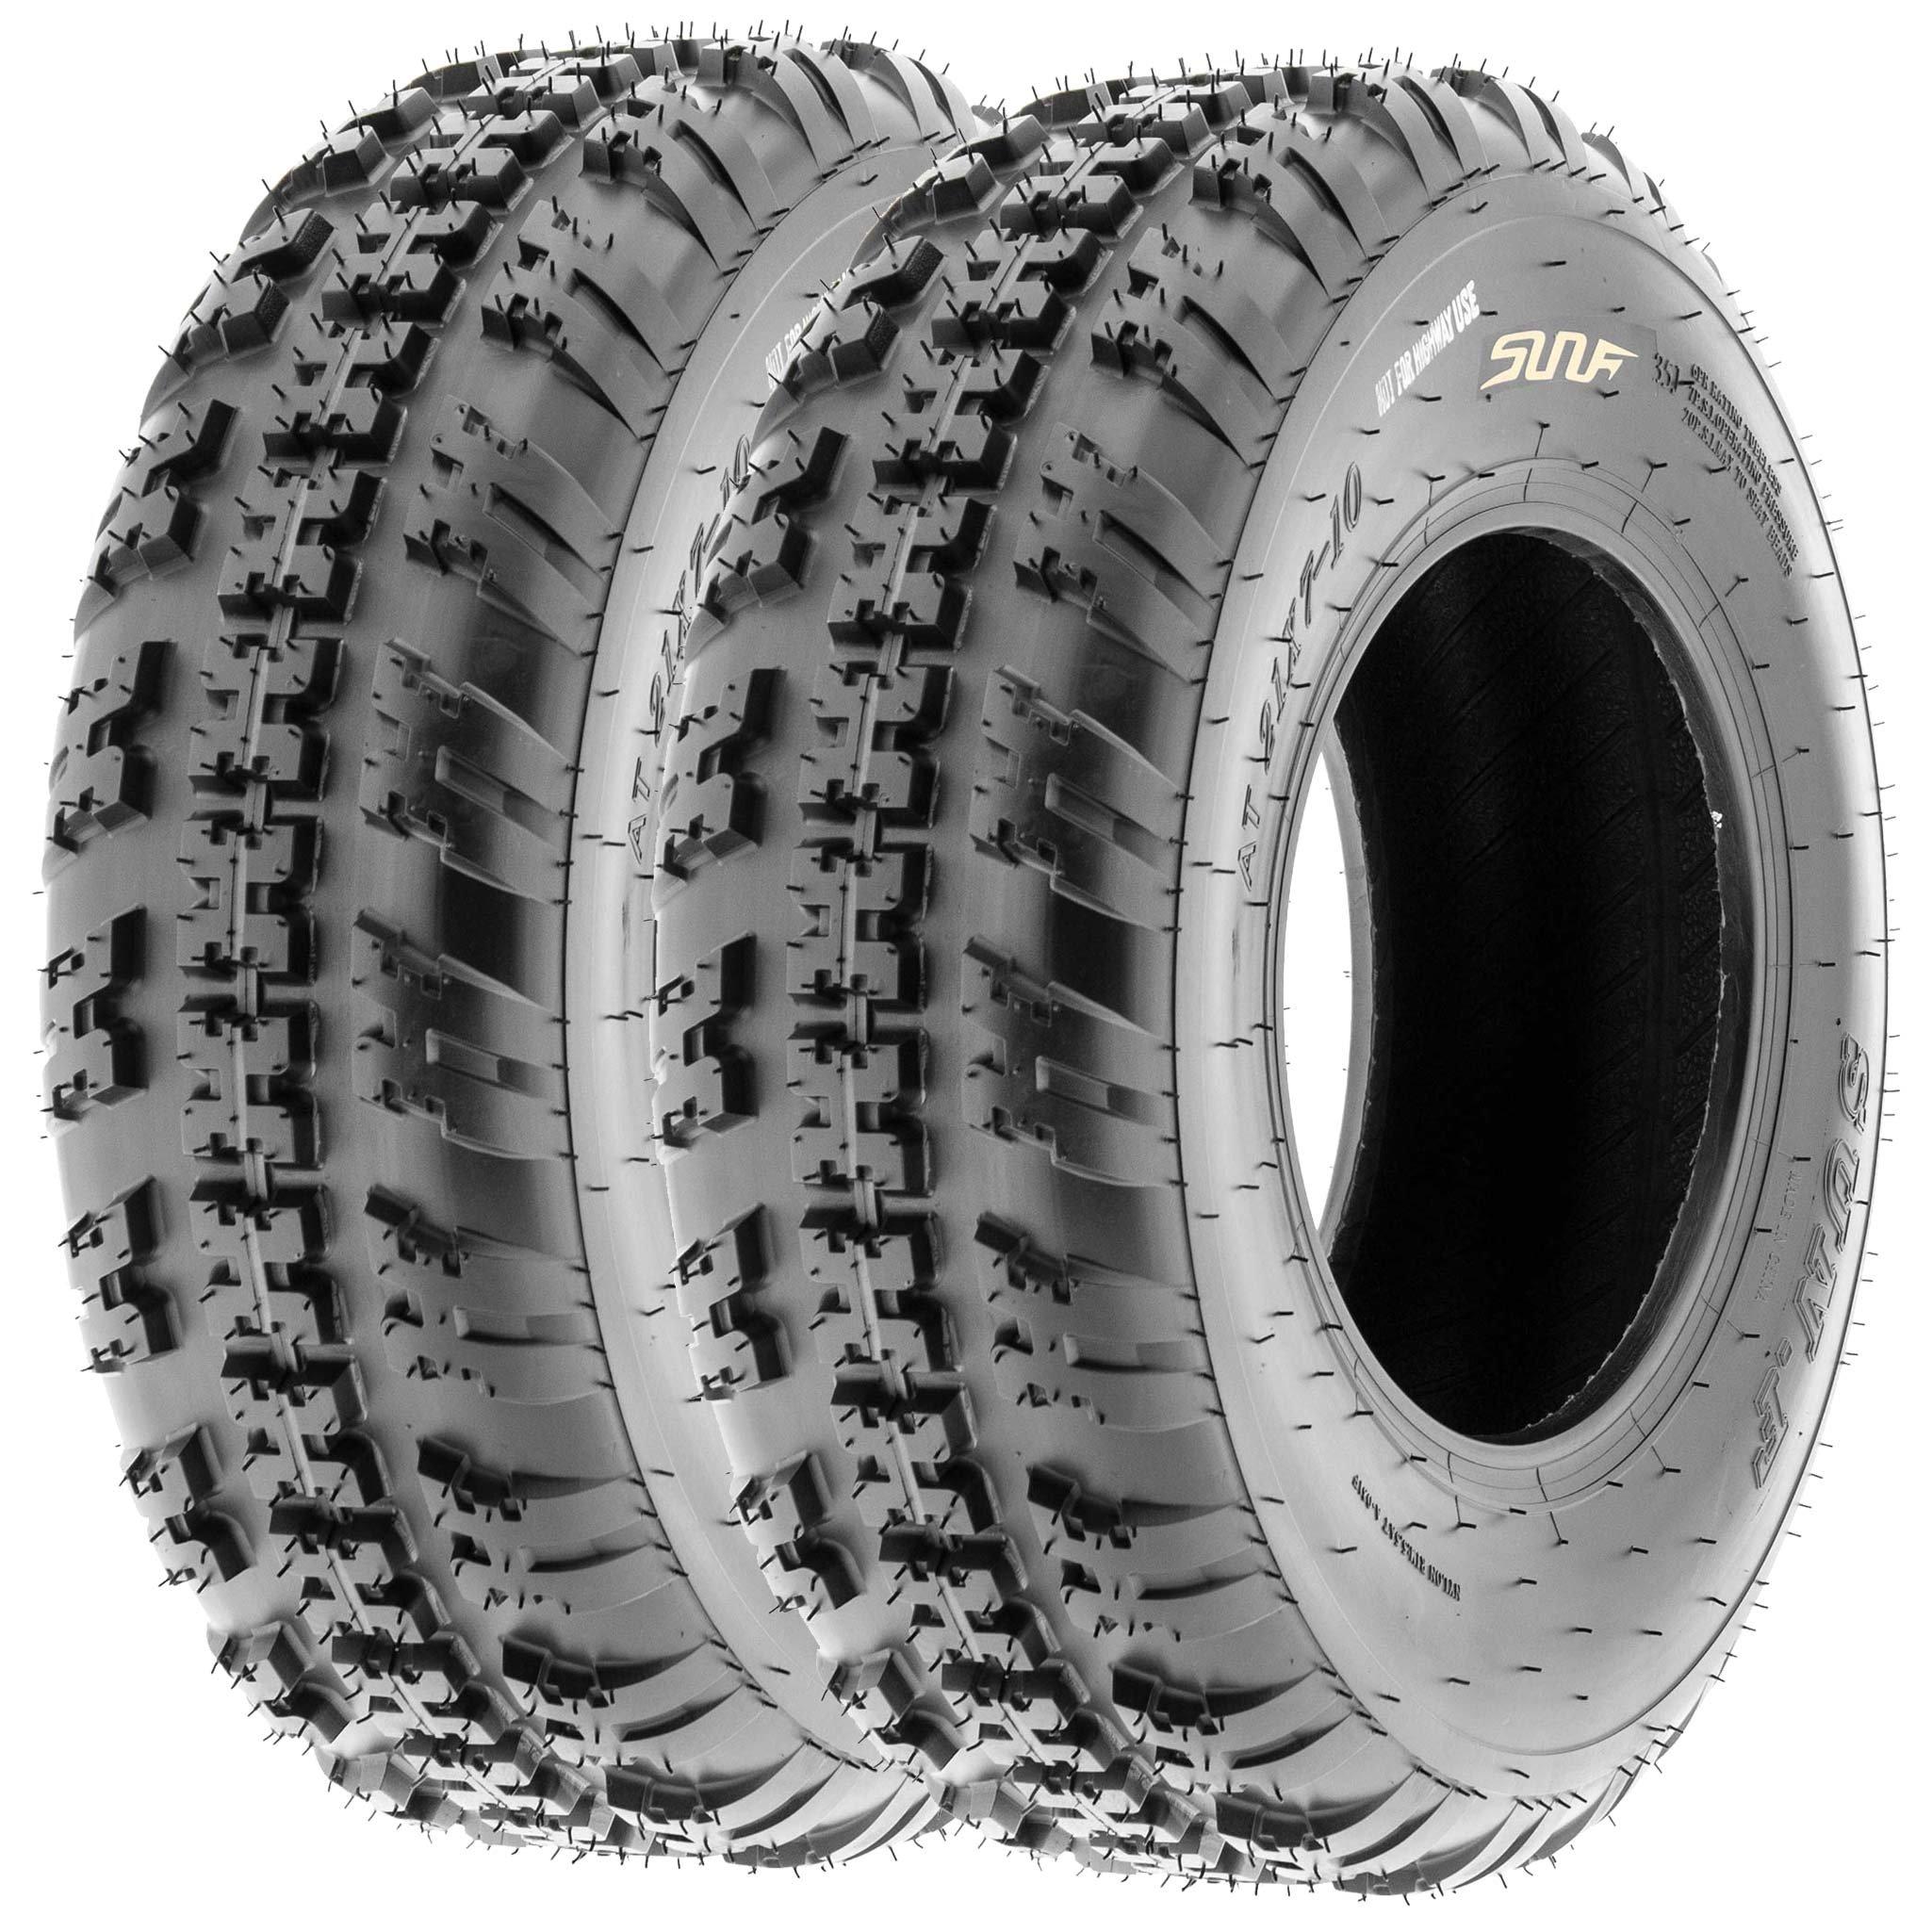 SunF 20x6-10 20x6x10 ATV UTV All Terrain Trail Replacement 6 PR Tubeless Tires A031, [Set of 2]